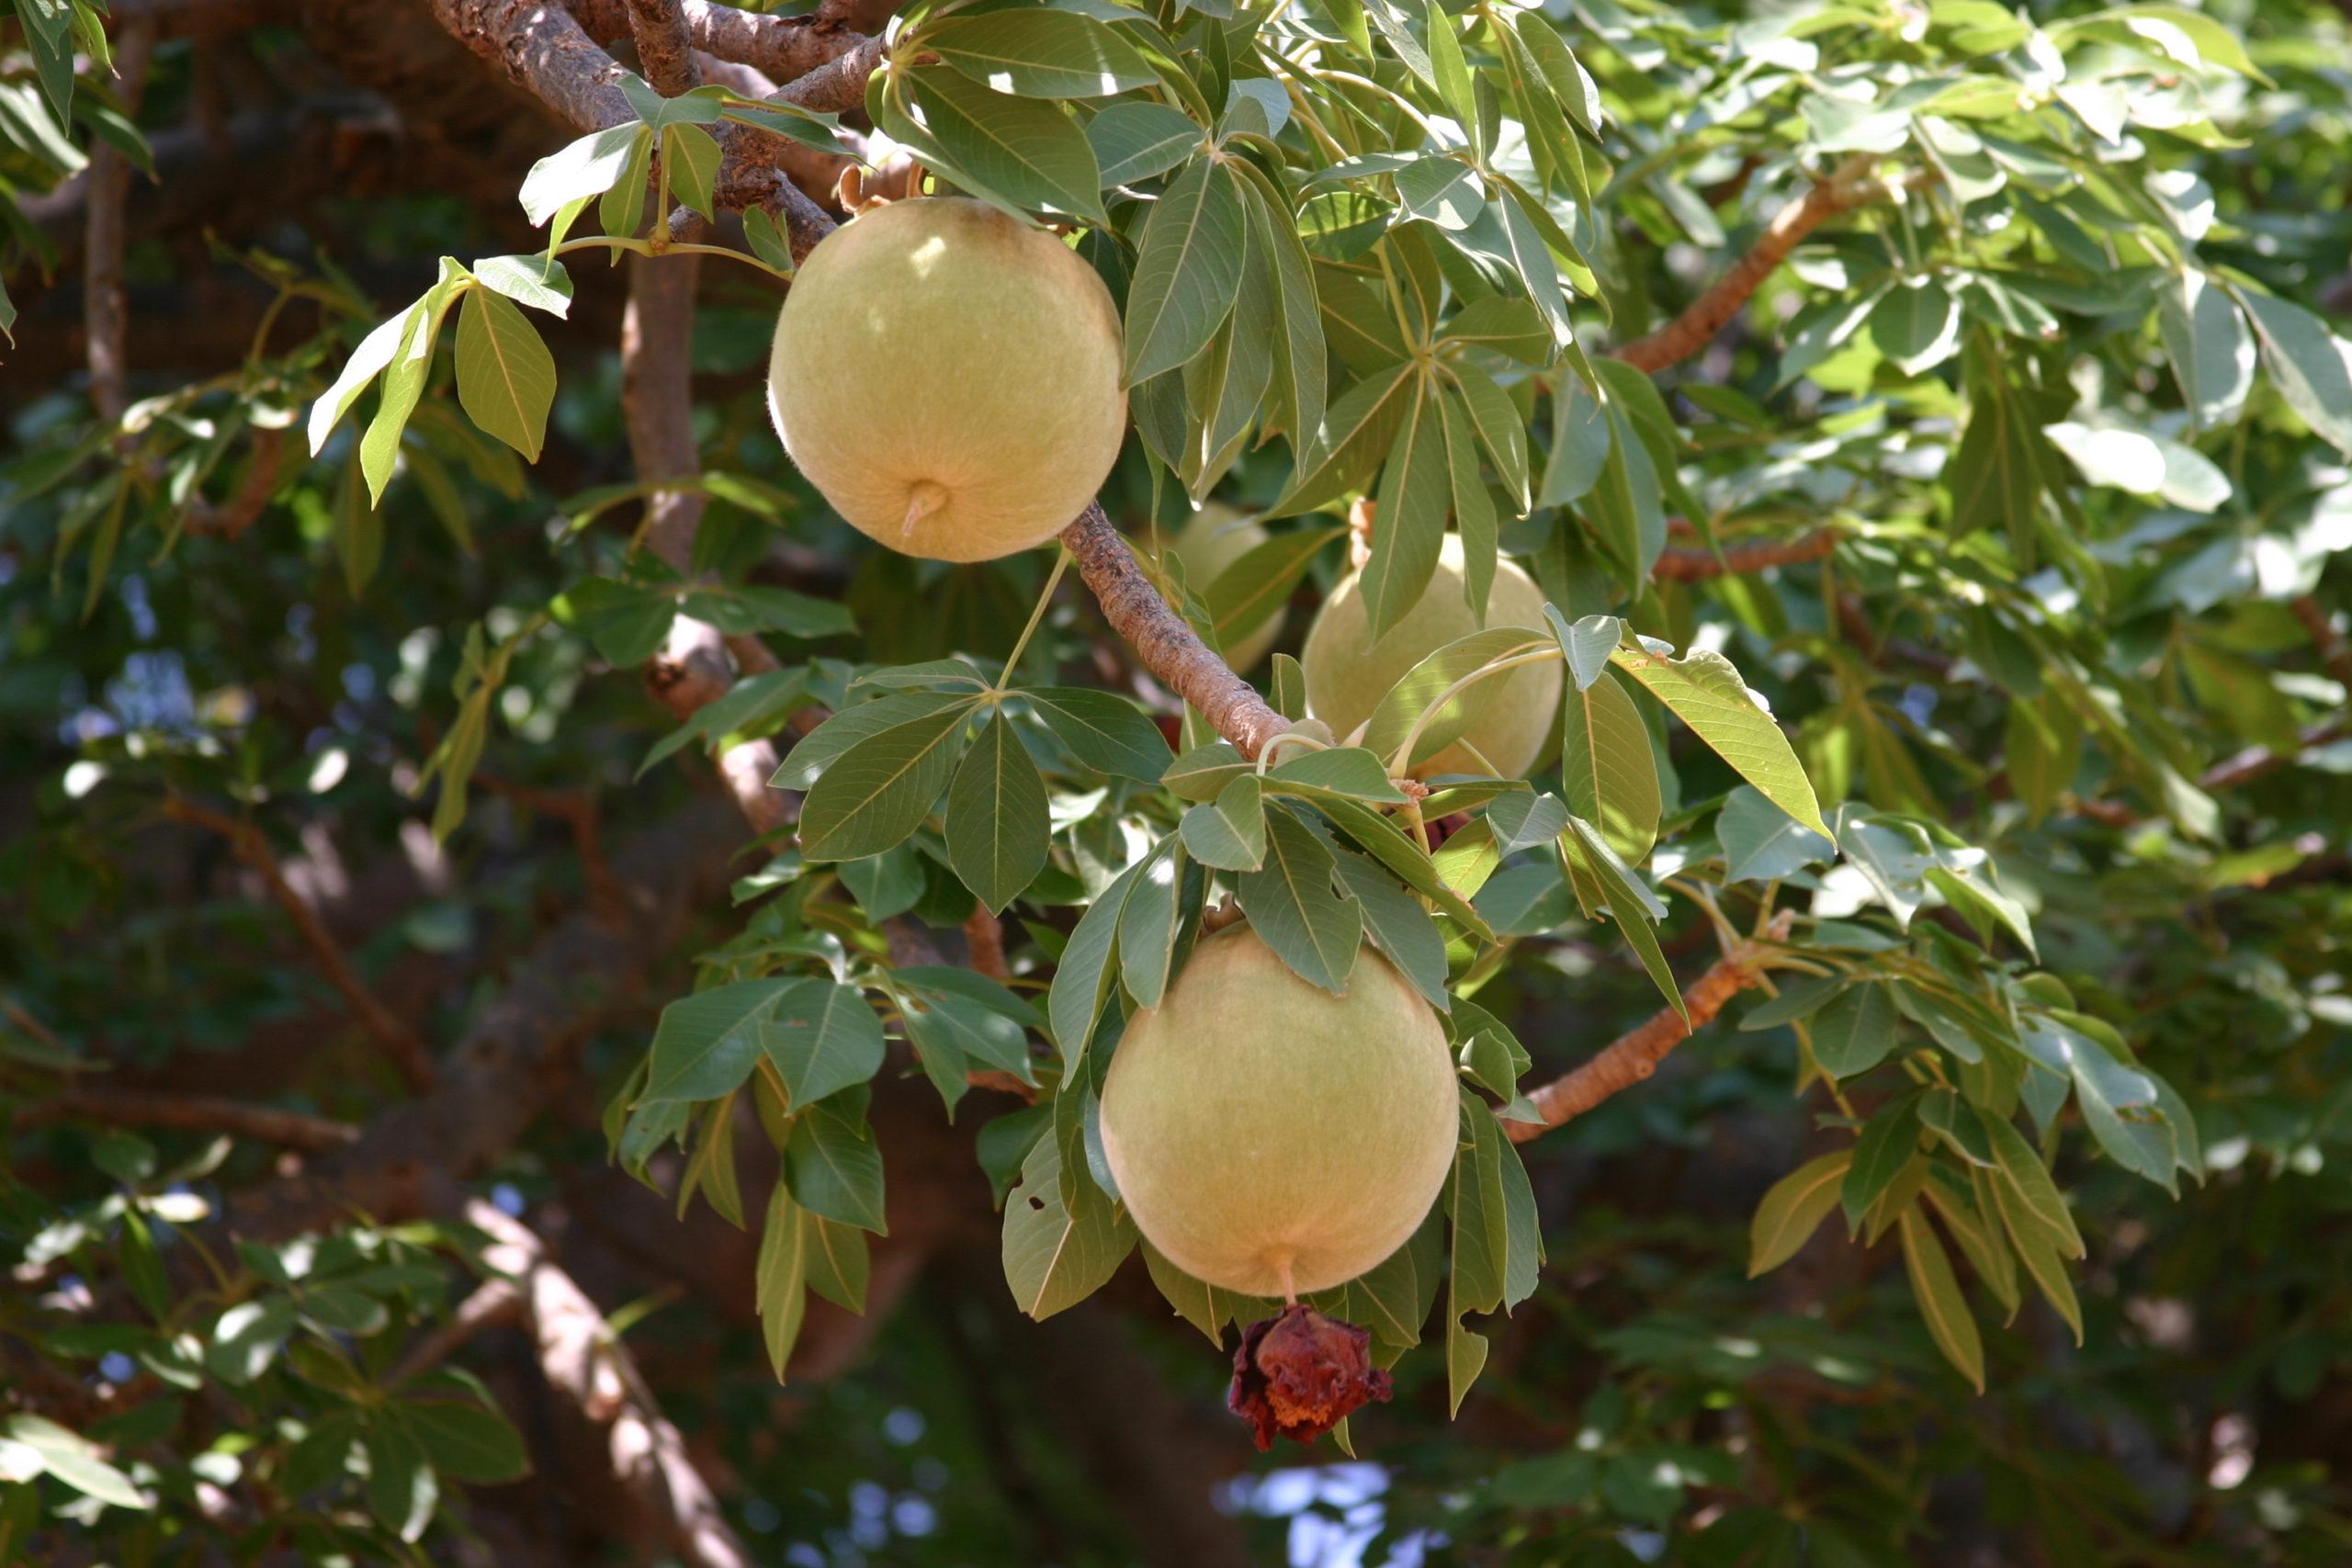 Eucaforest Eucalyptus Oils Producers and Exporters - Baobab Fruit